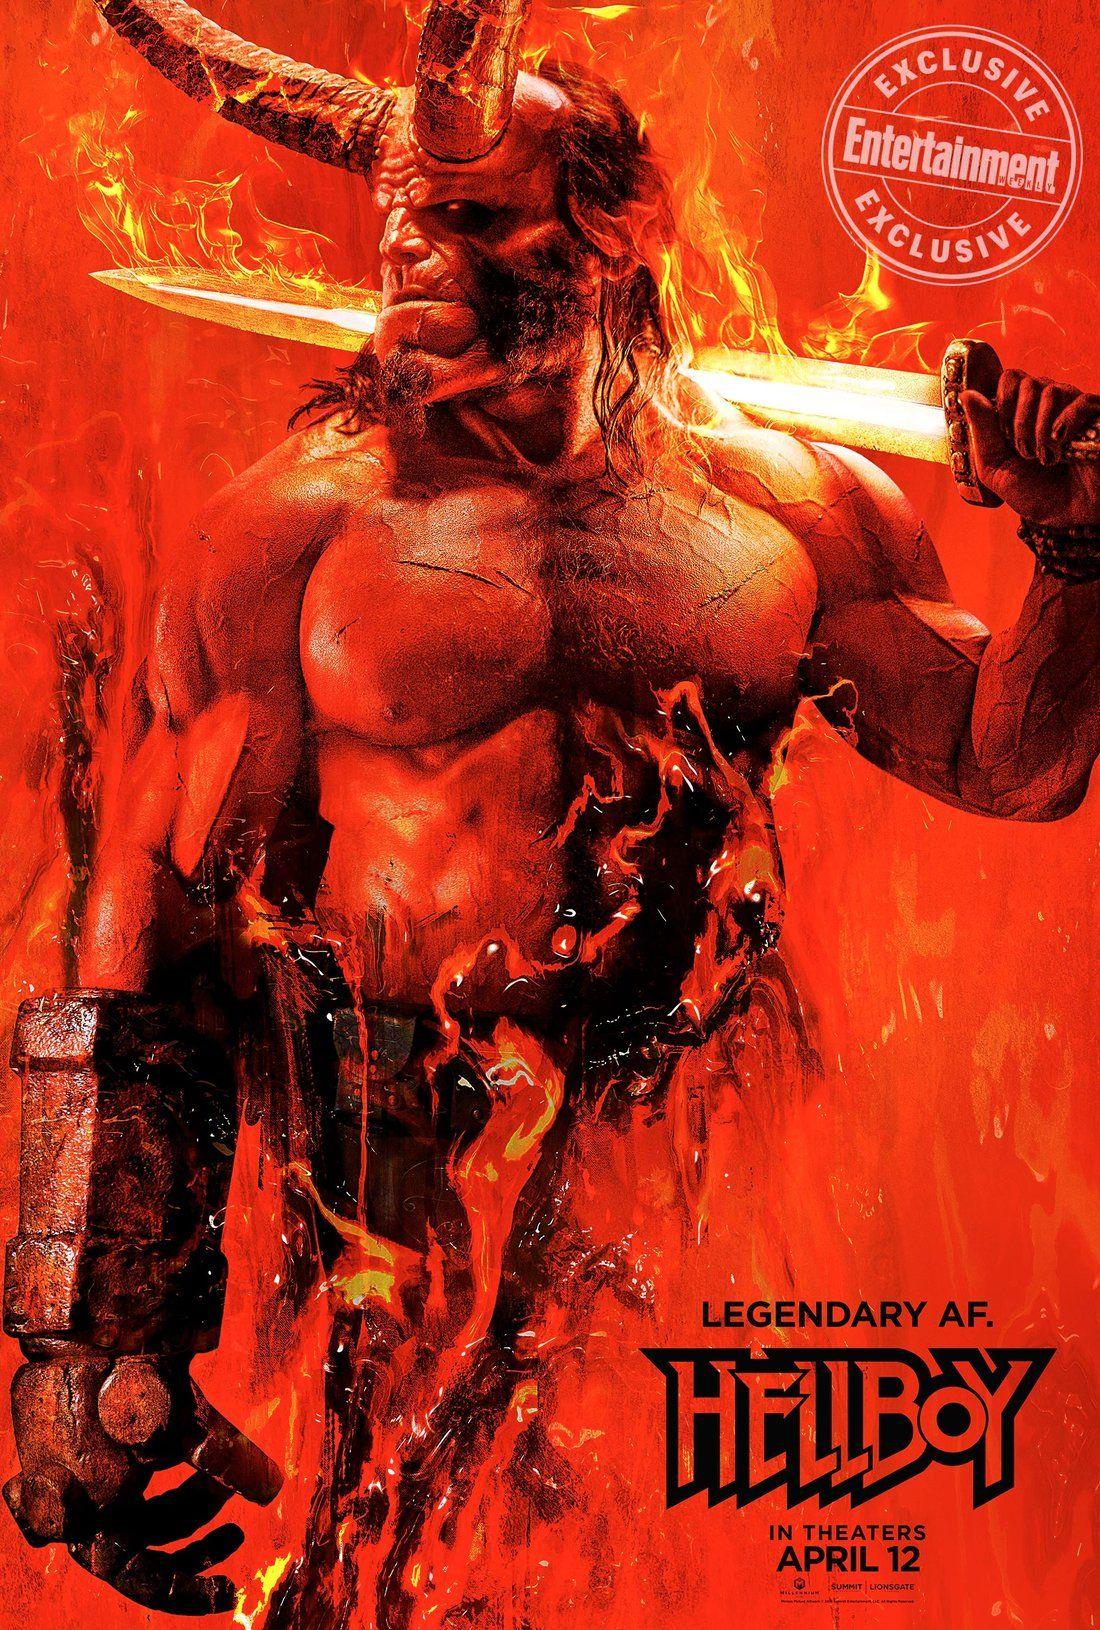 Hellboy Reboot Poster ... Milla Jovovich Movies 2004